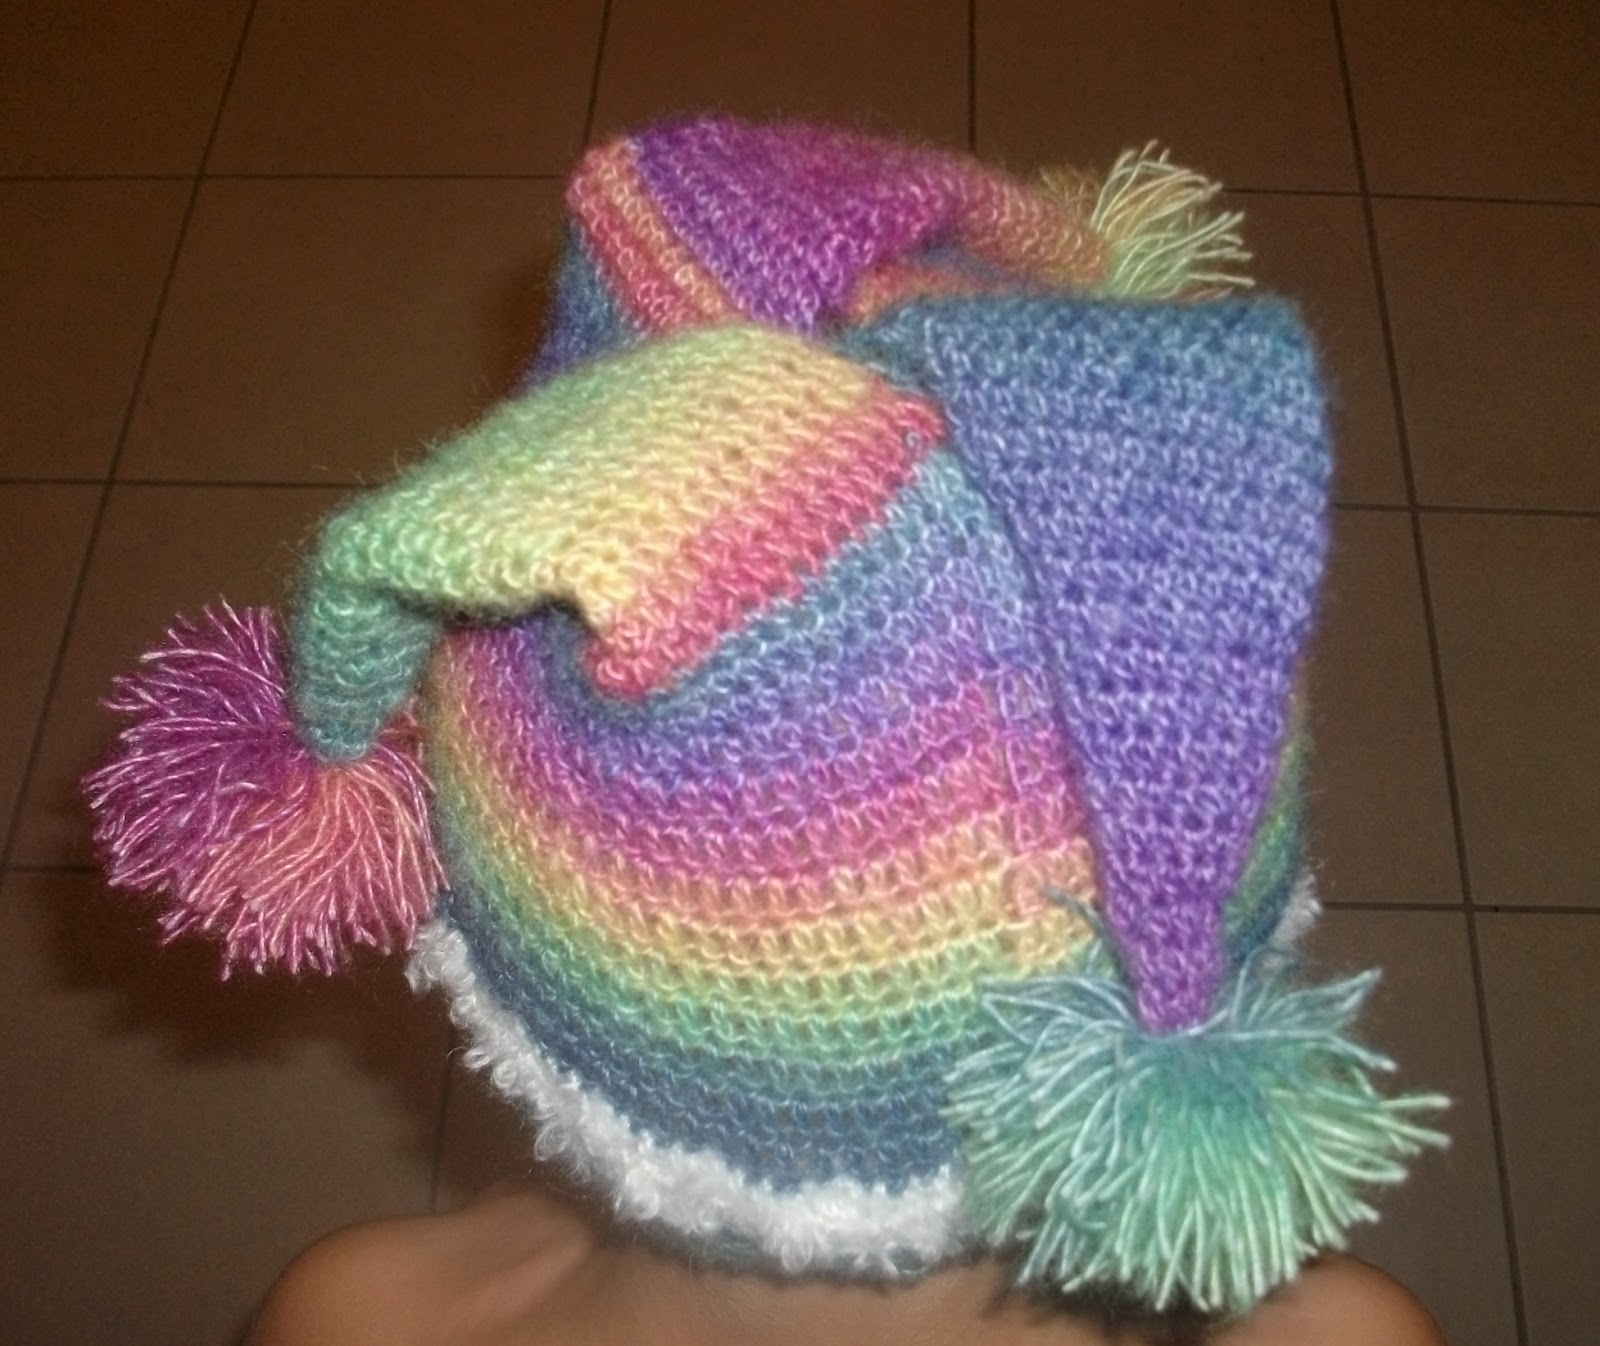 Knitting Pattern For Jester Wool : the crochet case: Court Jester